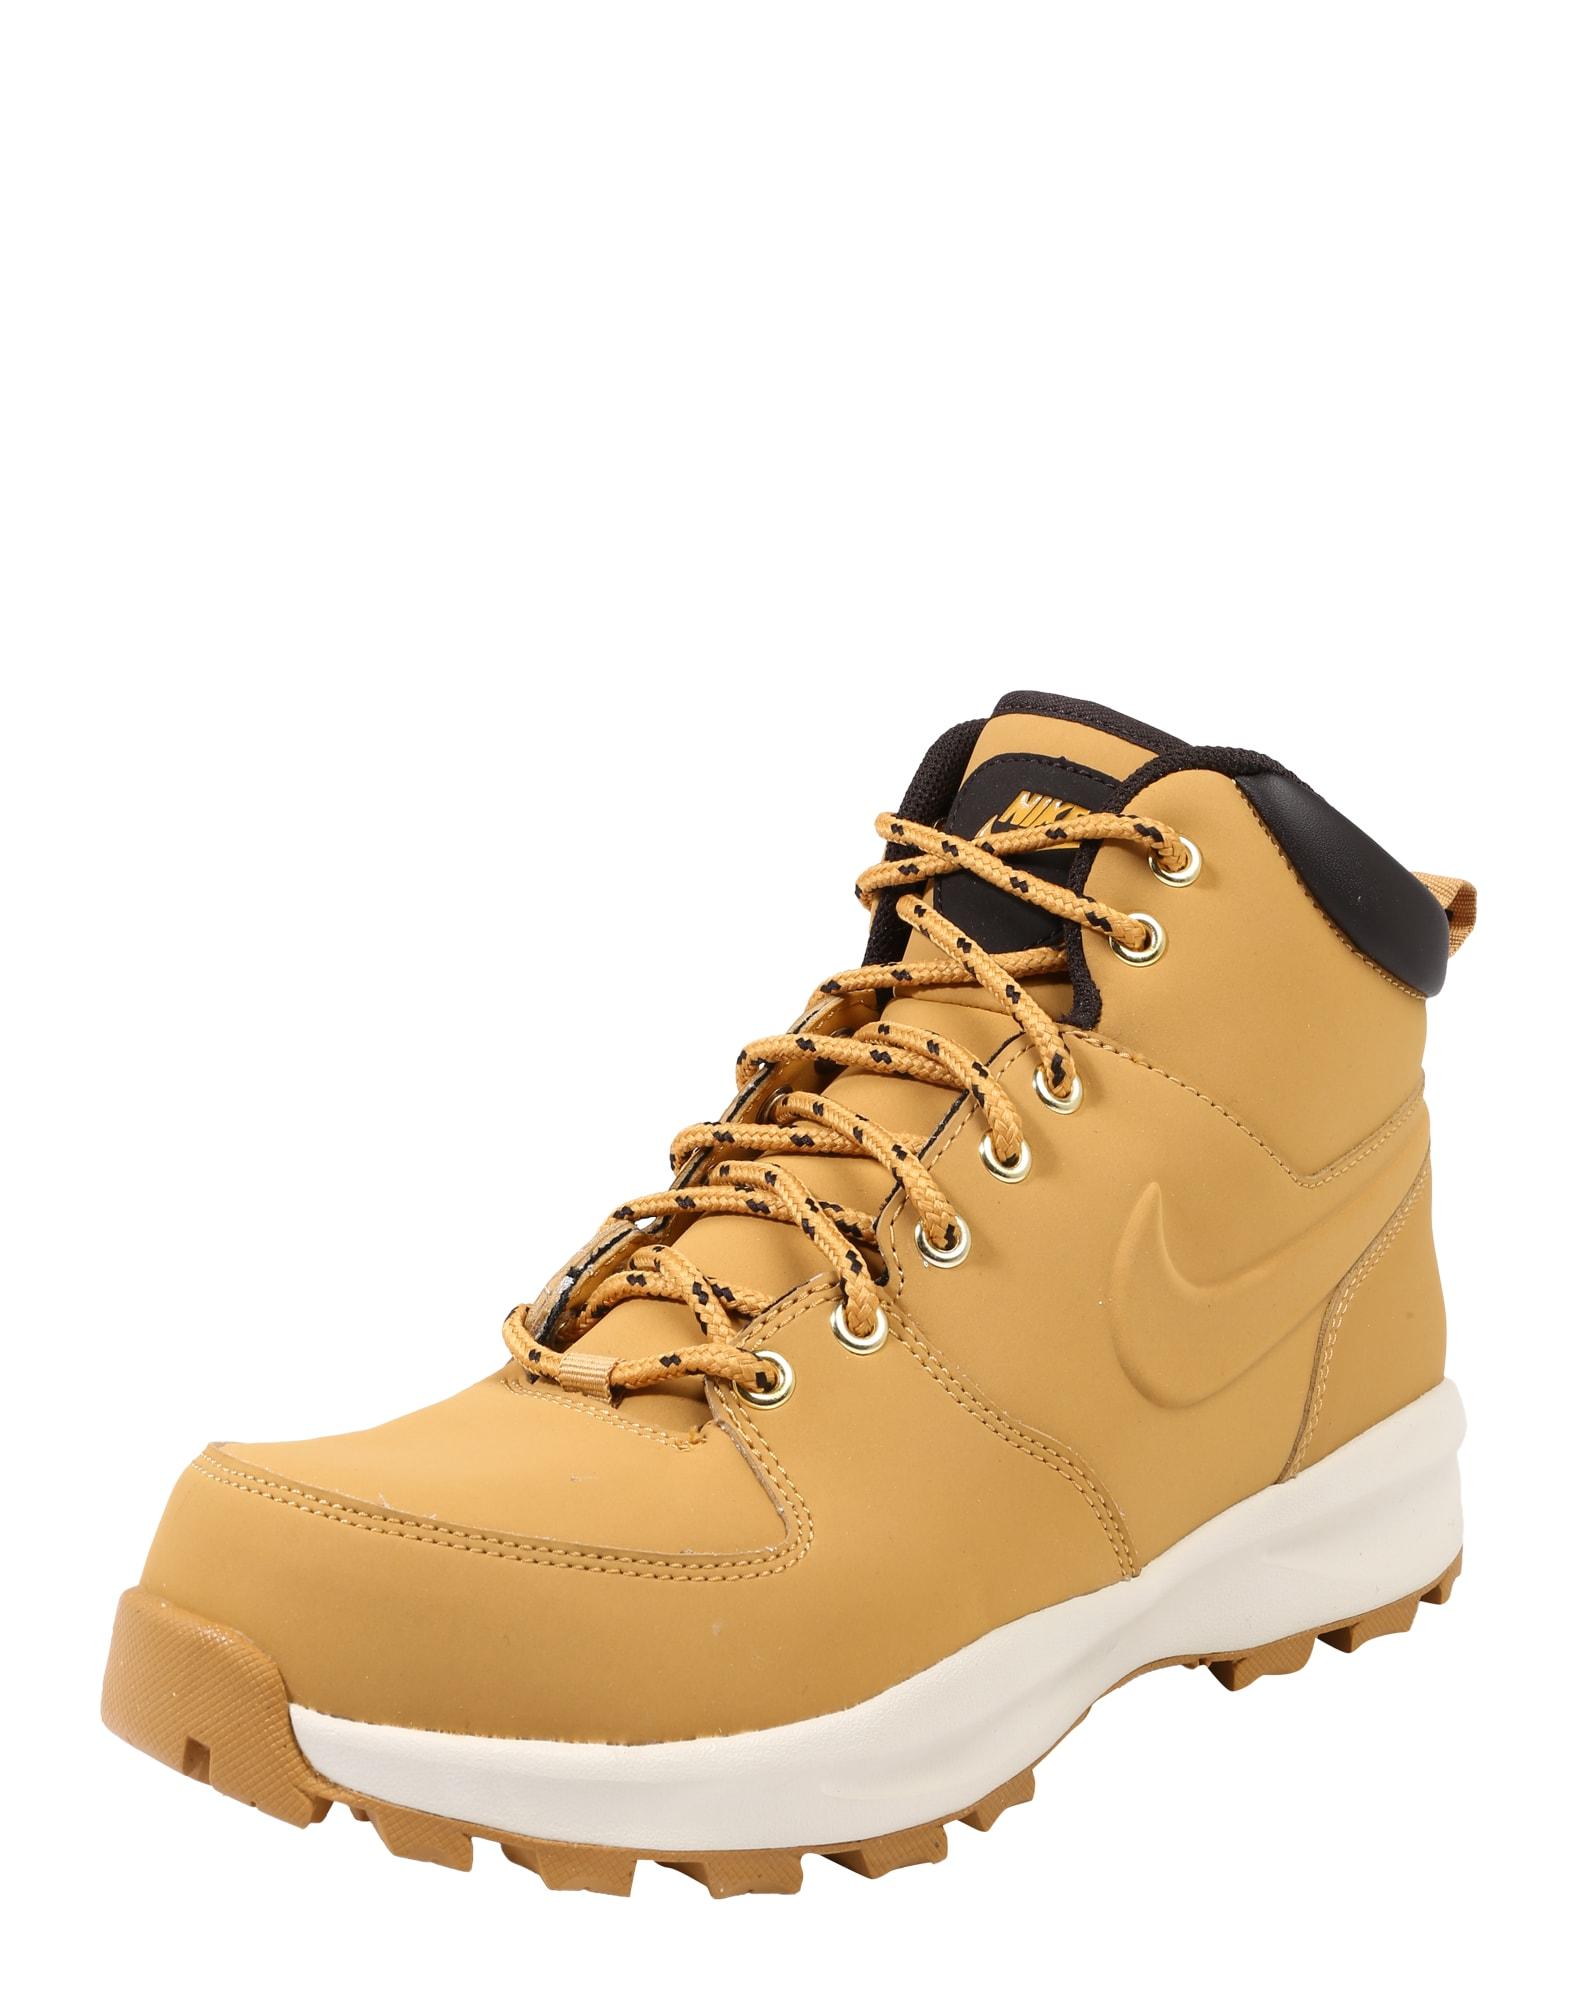 Nike Sportswear, Heren Sneakers hoog 'Manoa', sand